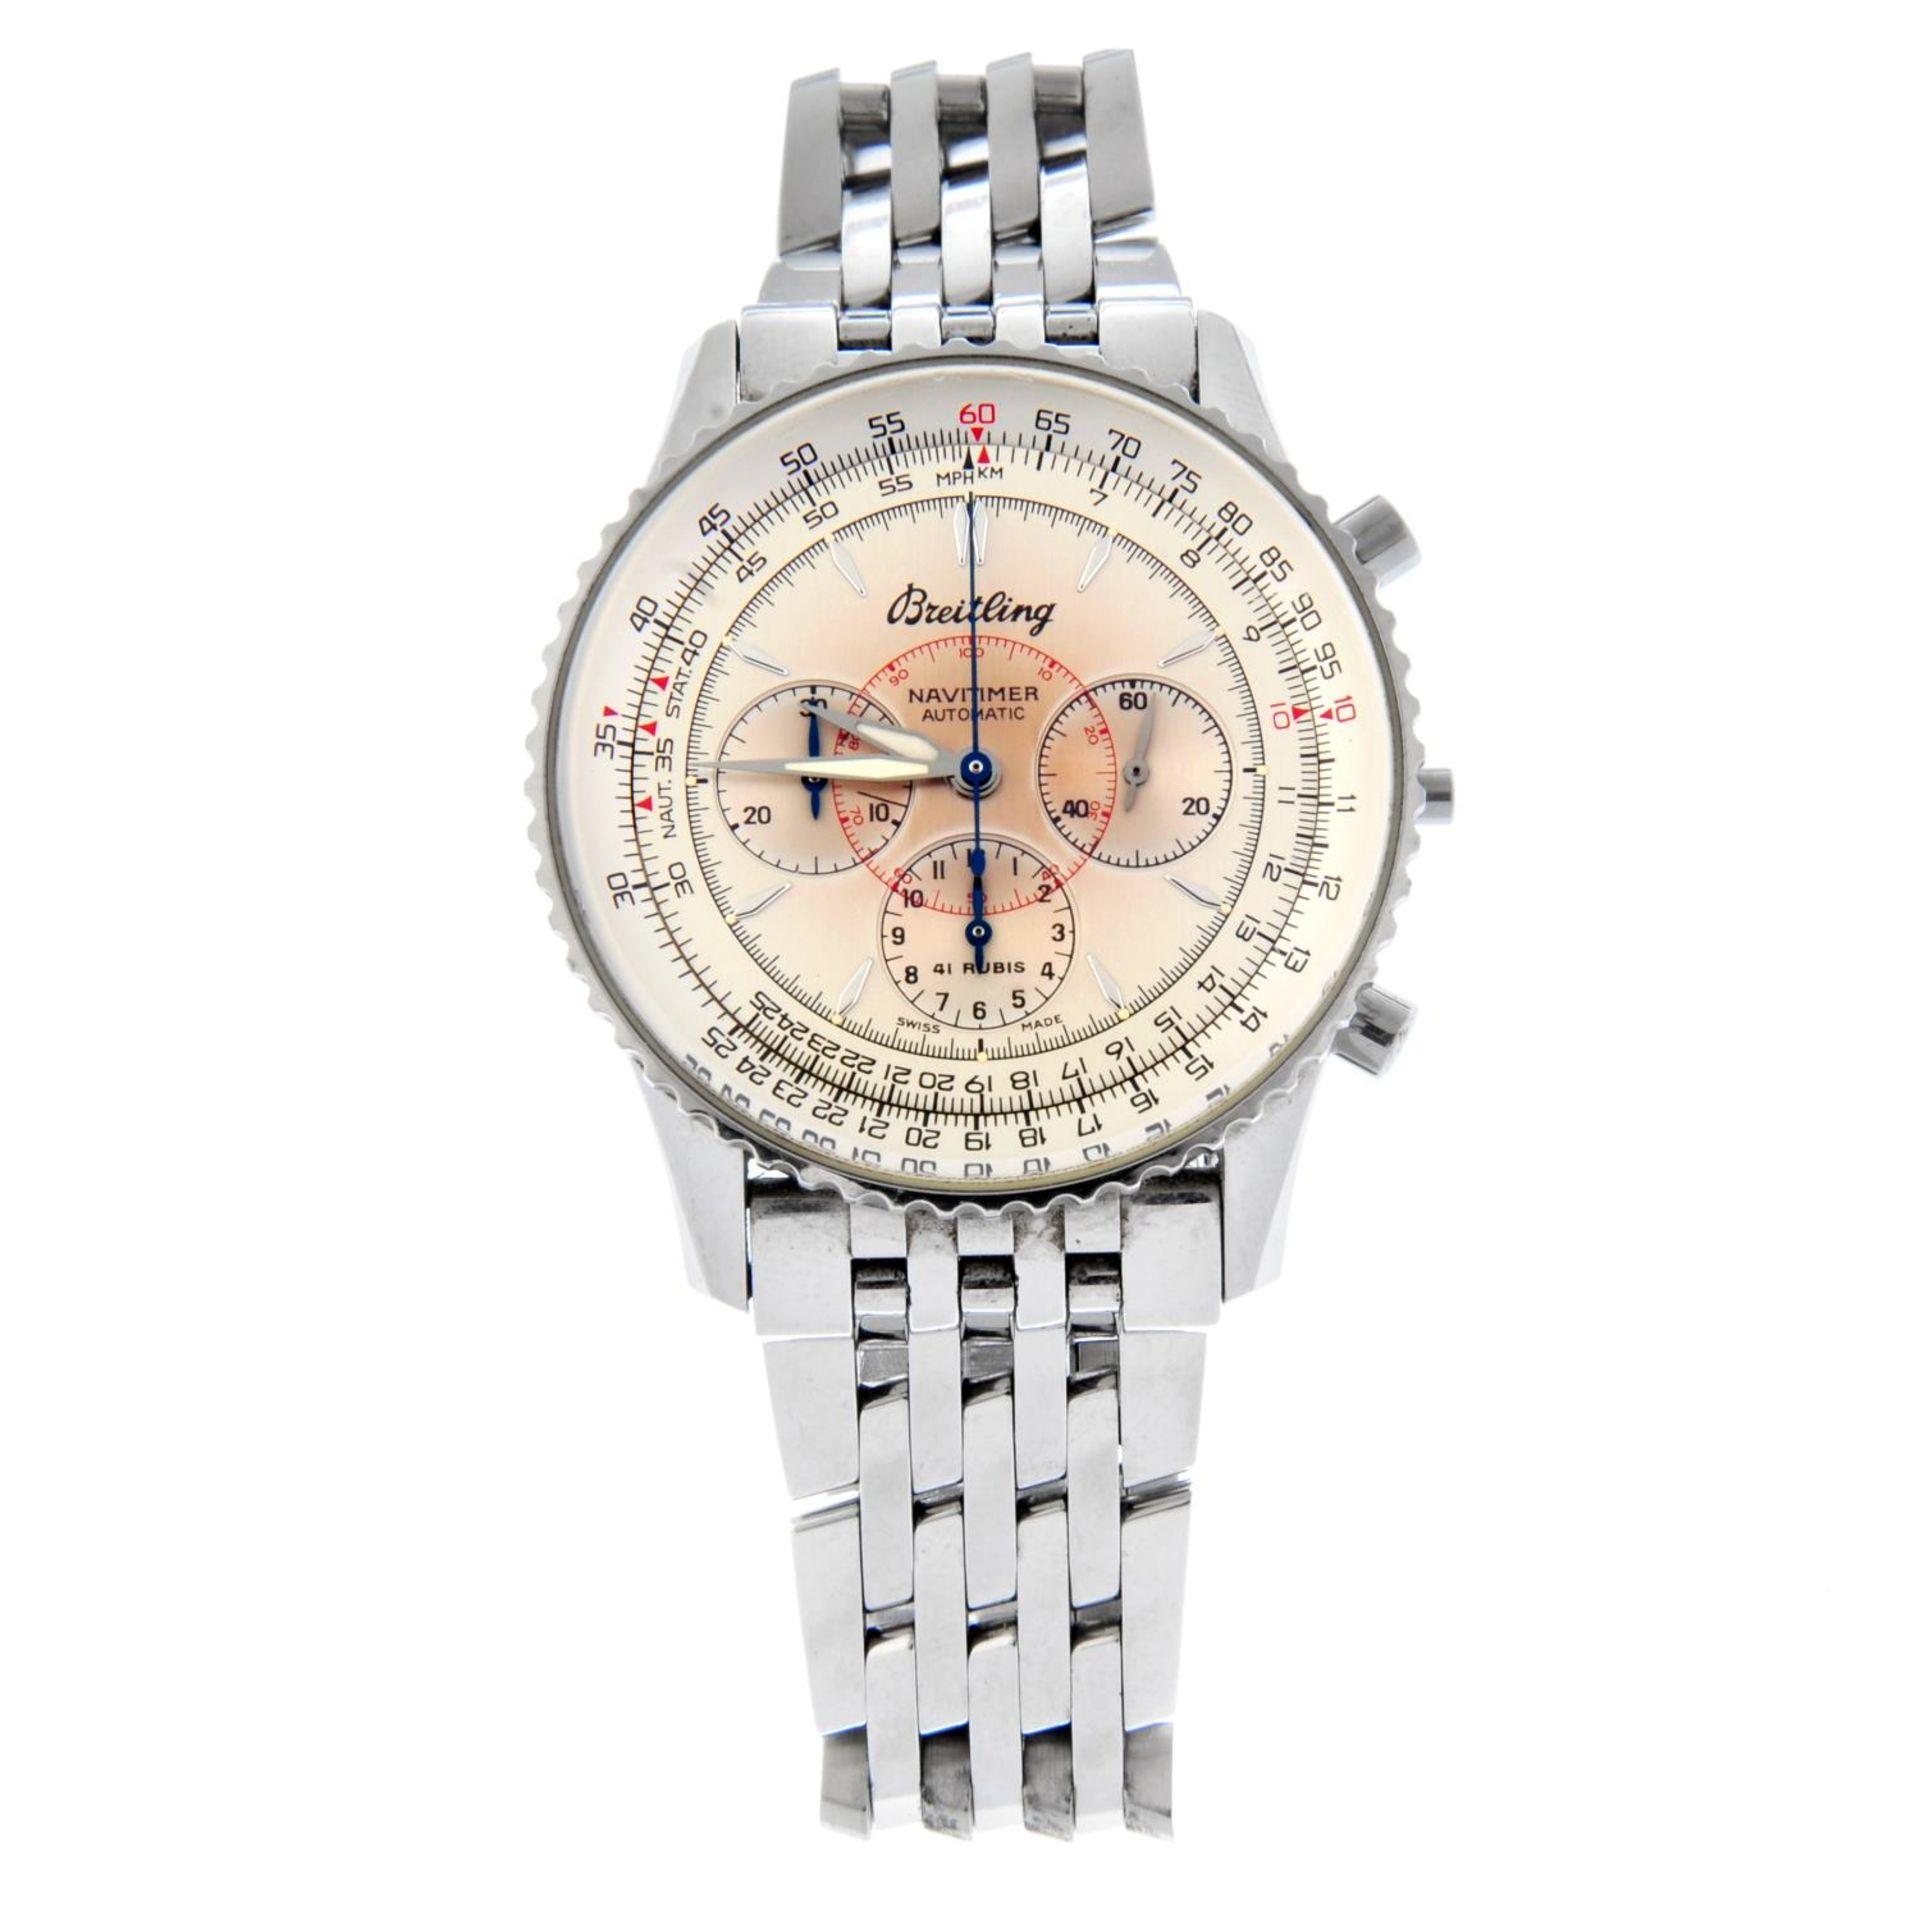 BREITLING - a Navitimer Montbrilliant bracelet watch.